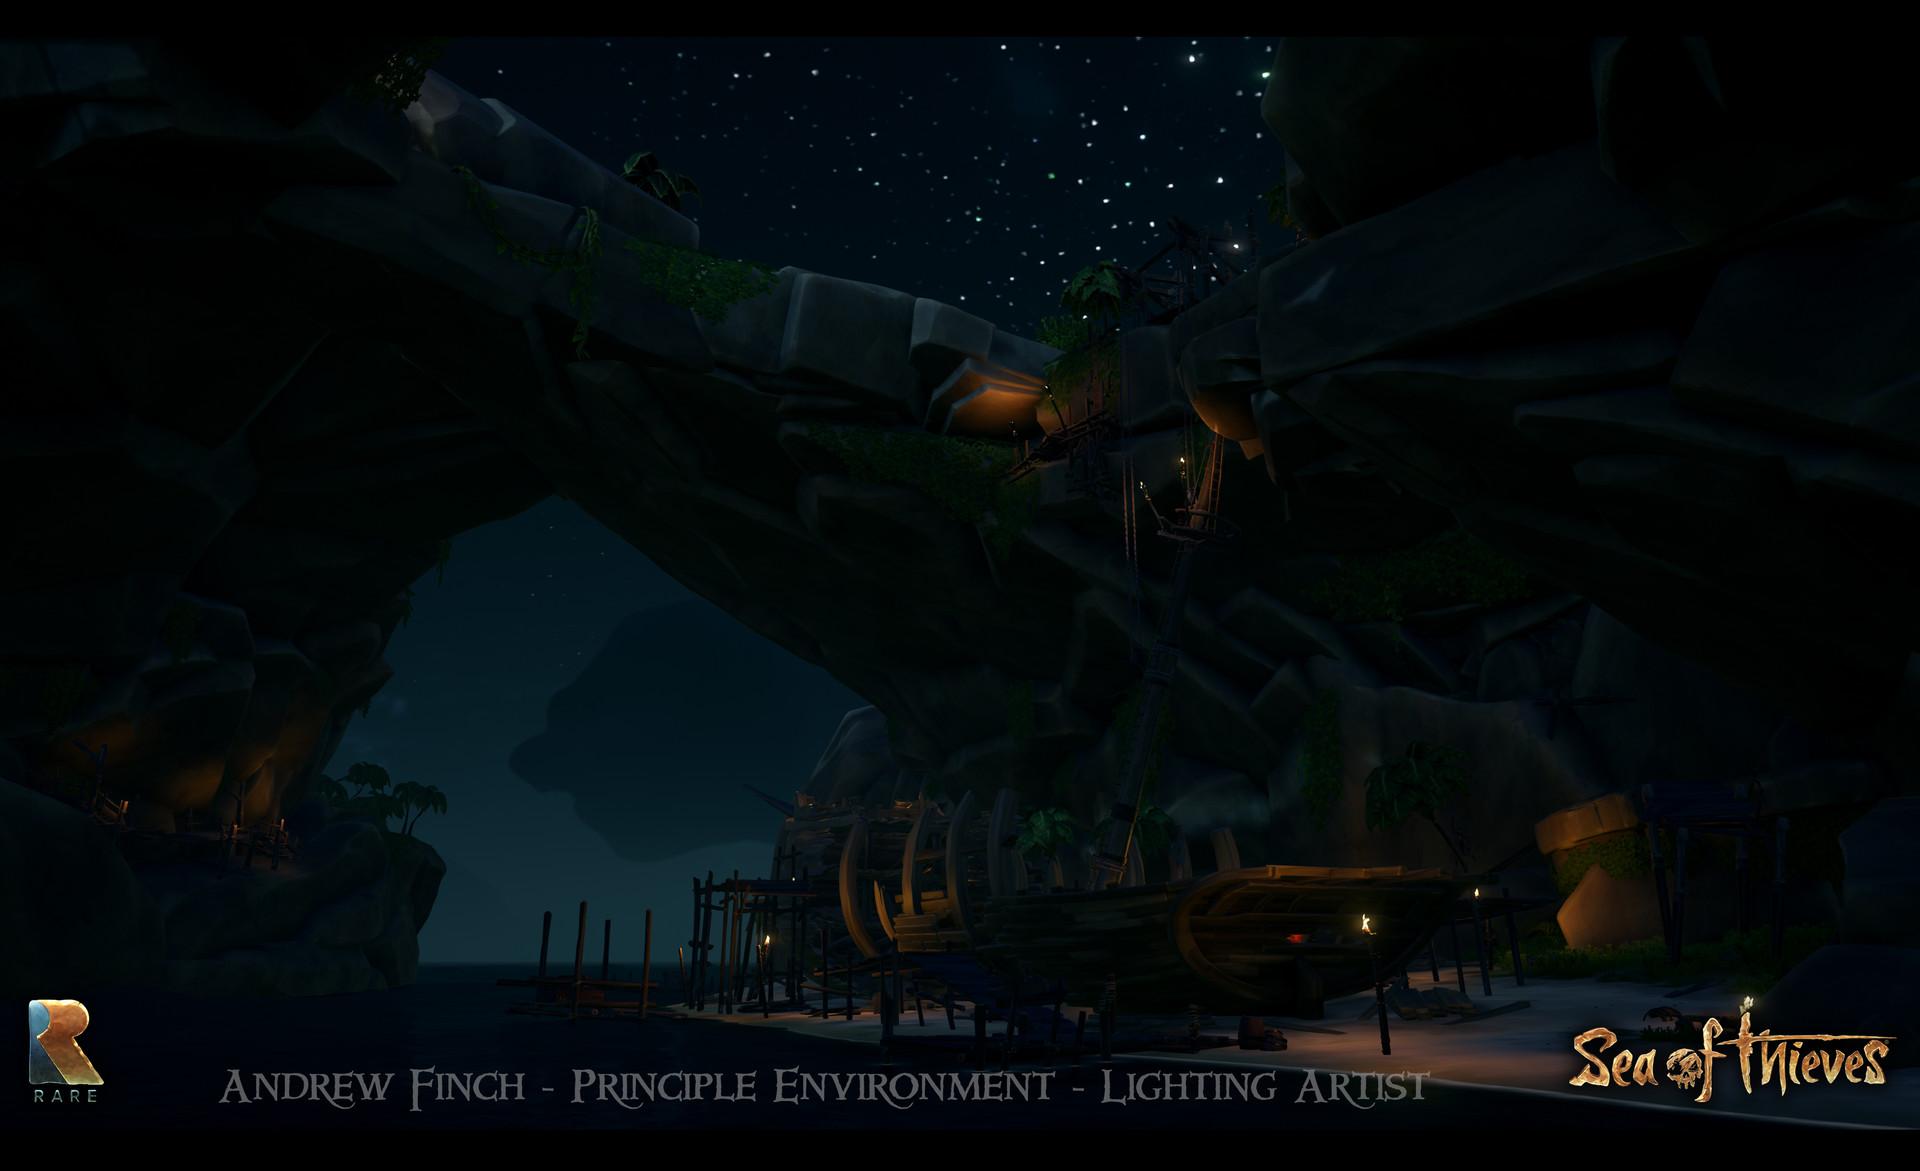 Andrew finch island lighting 33